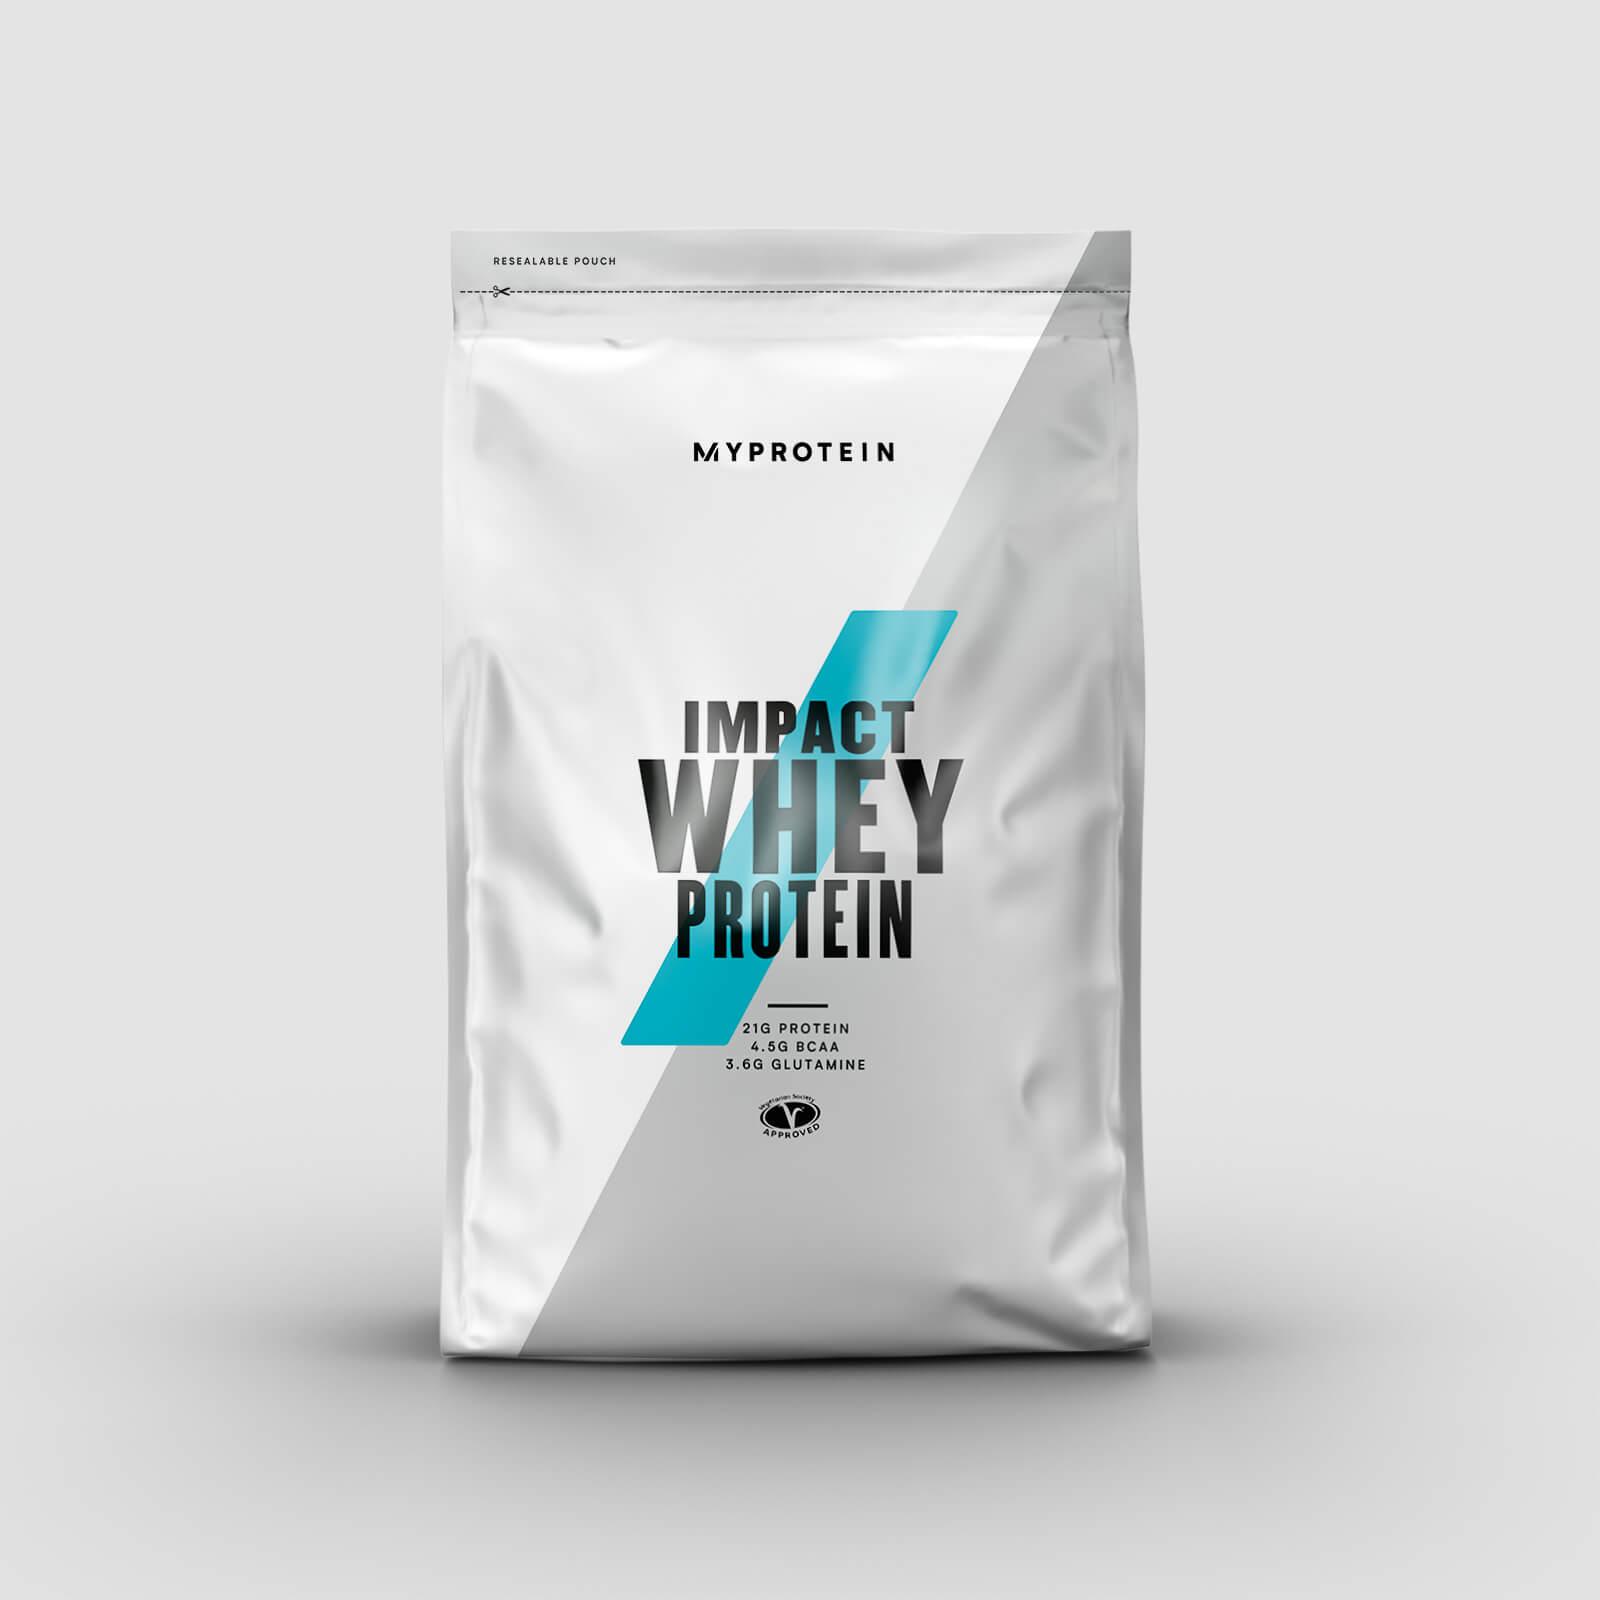 Myprotein Impact Whey Protein - 2.5kg - Chocolat-Beurre de Cacahuète